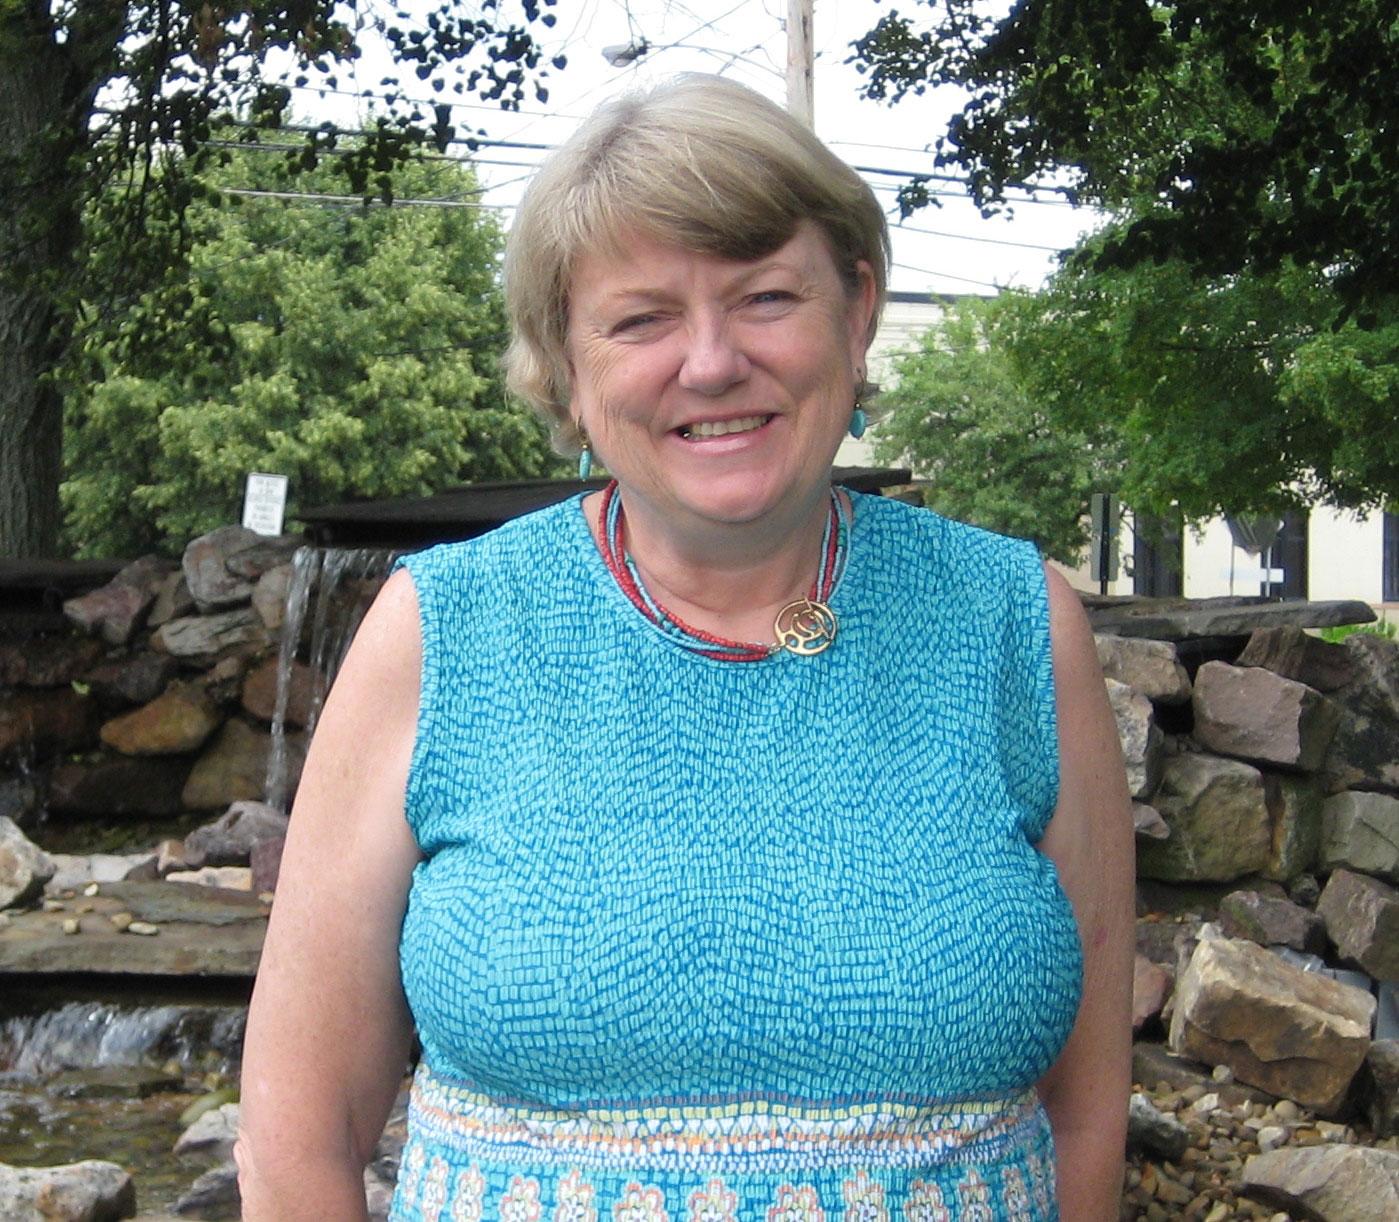 Mary Chowenhill